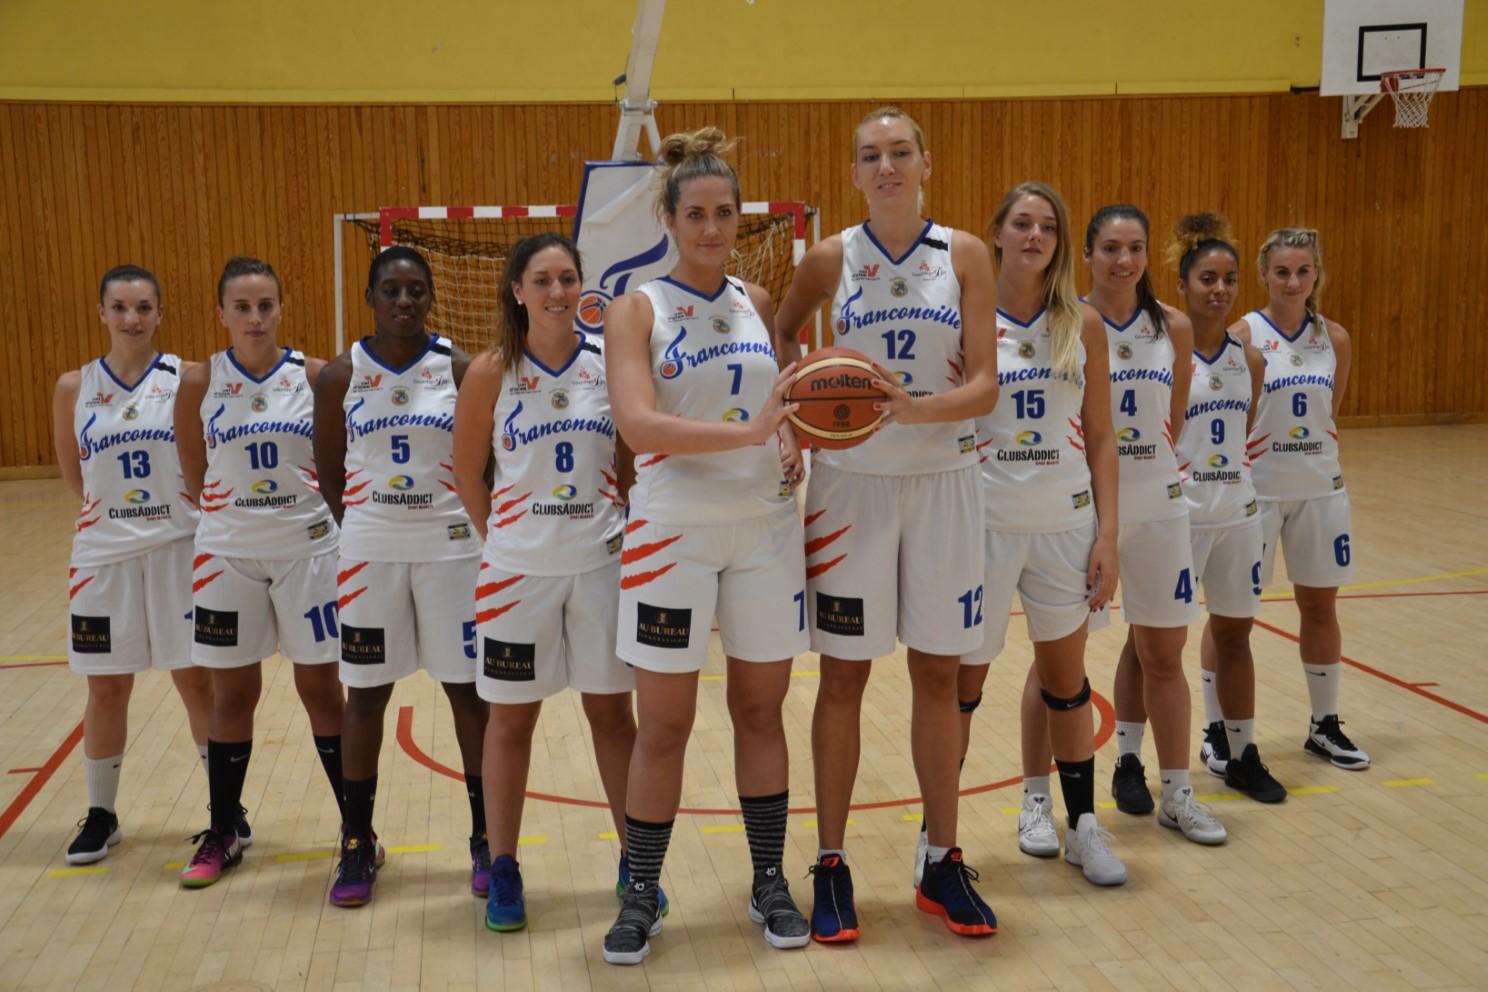 Equipe du Basket Club Franconville Plessis Bouchard